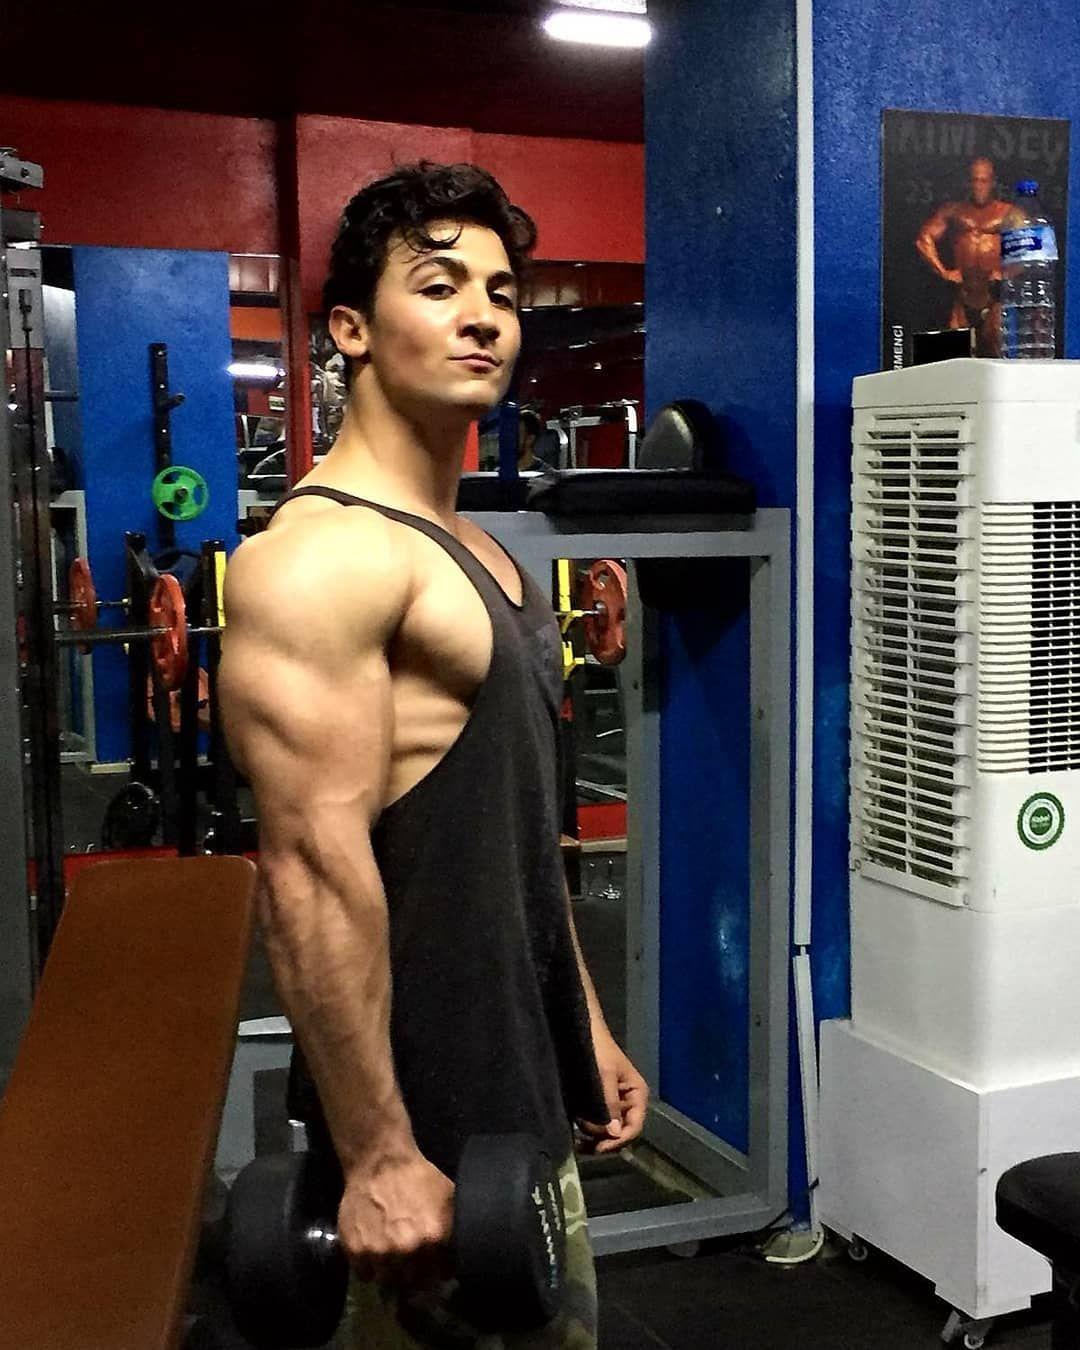 ✌ #aesthetics #bodybuilding #bodyengineer #gain #fitness #fit #shredded #zyzz #gym #model #fitnessmo...